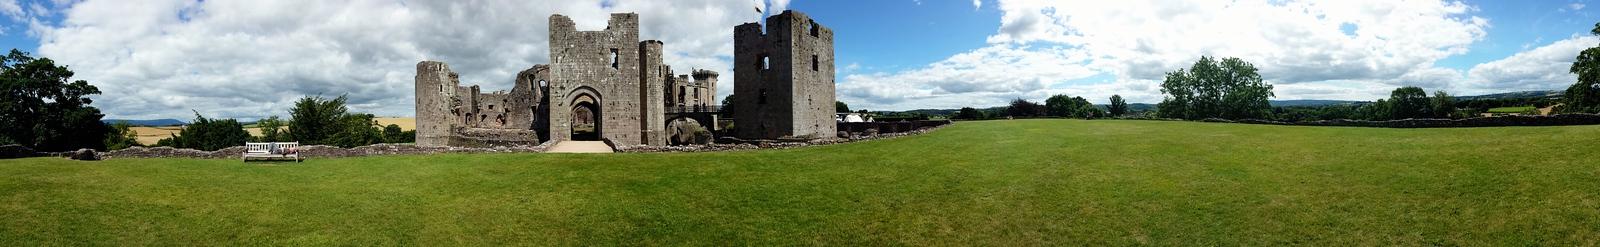 My trip to Wales